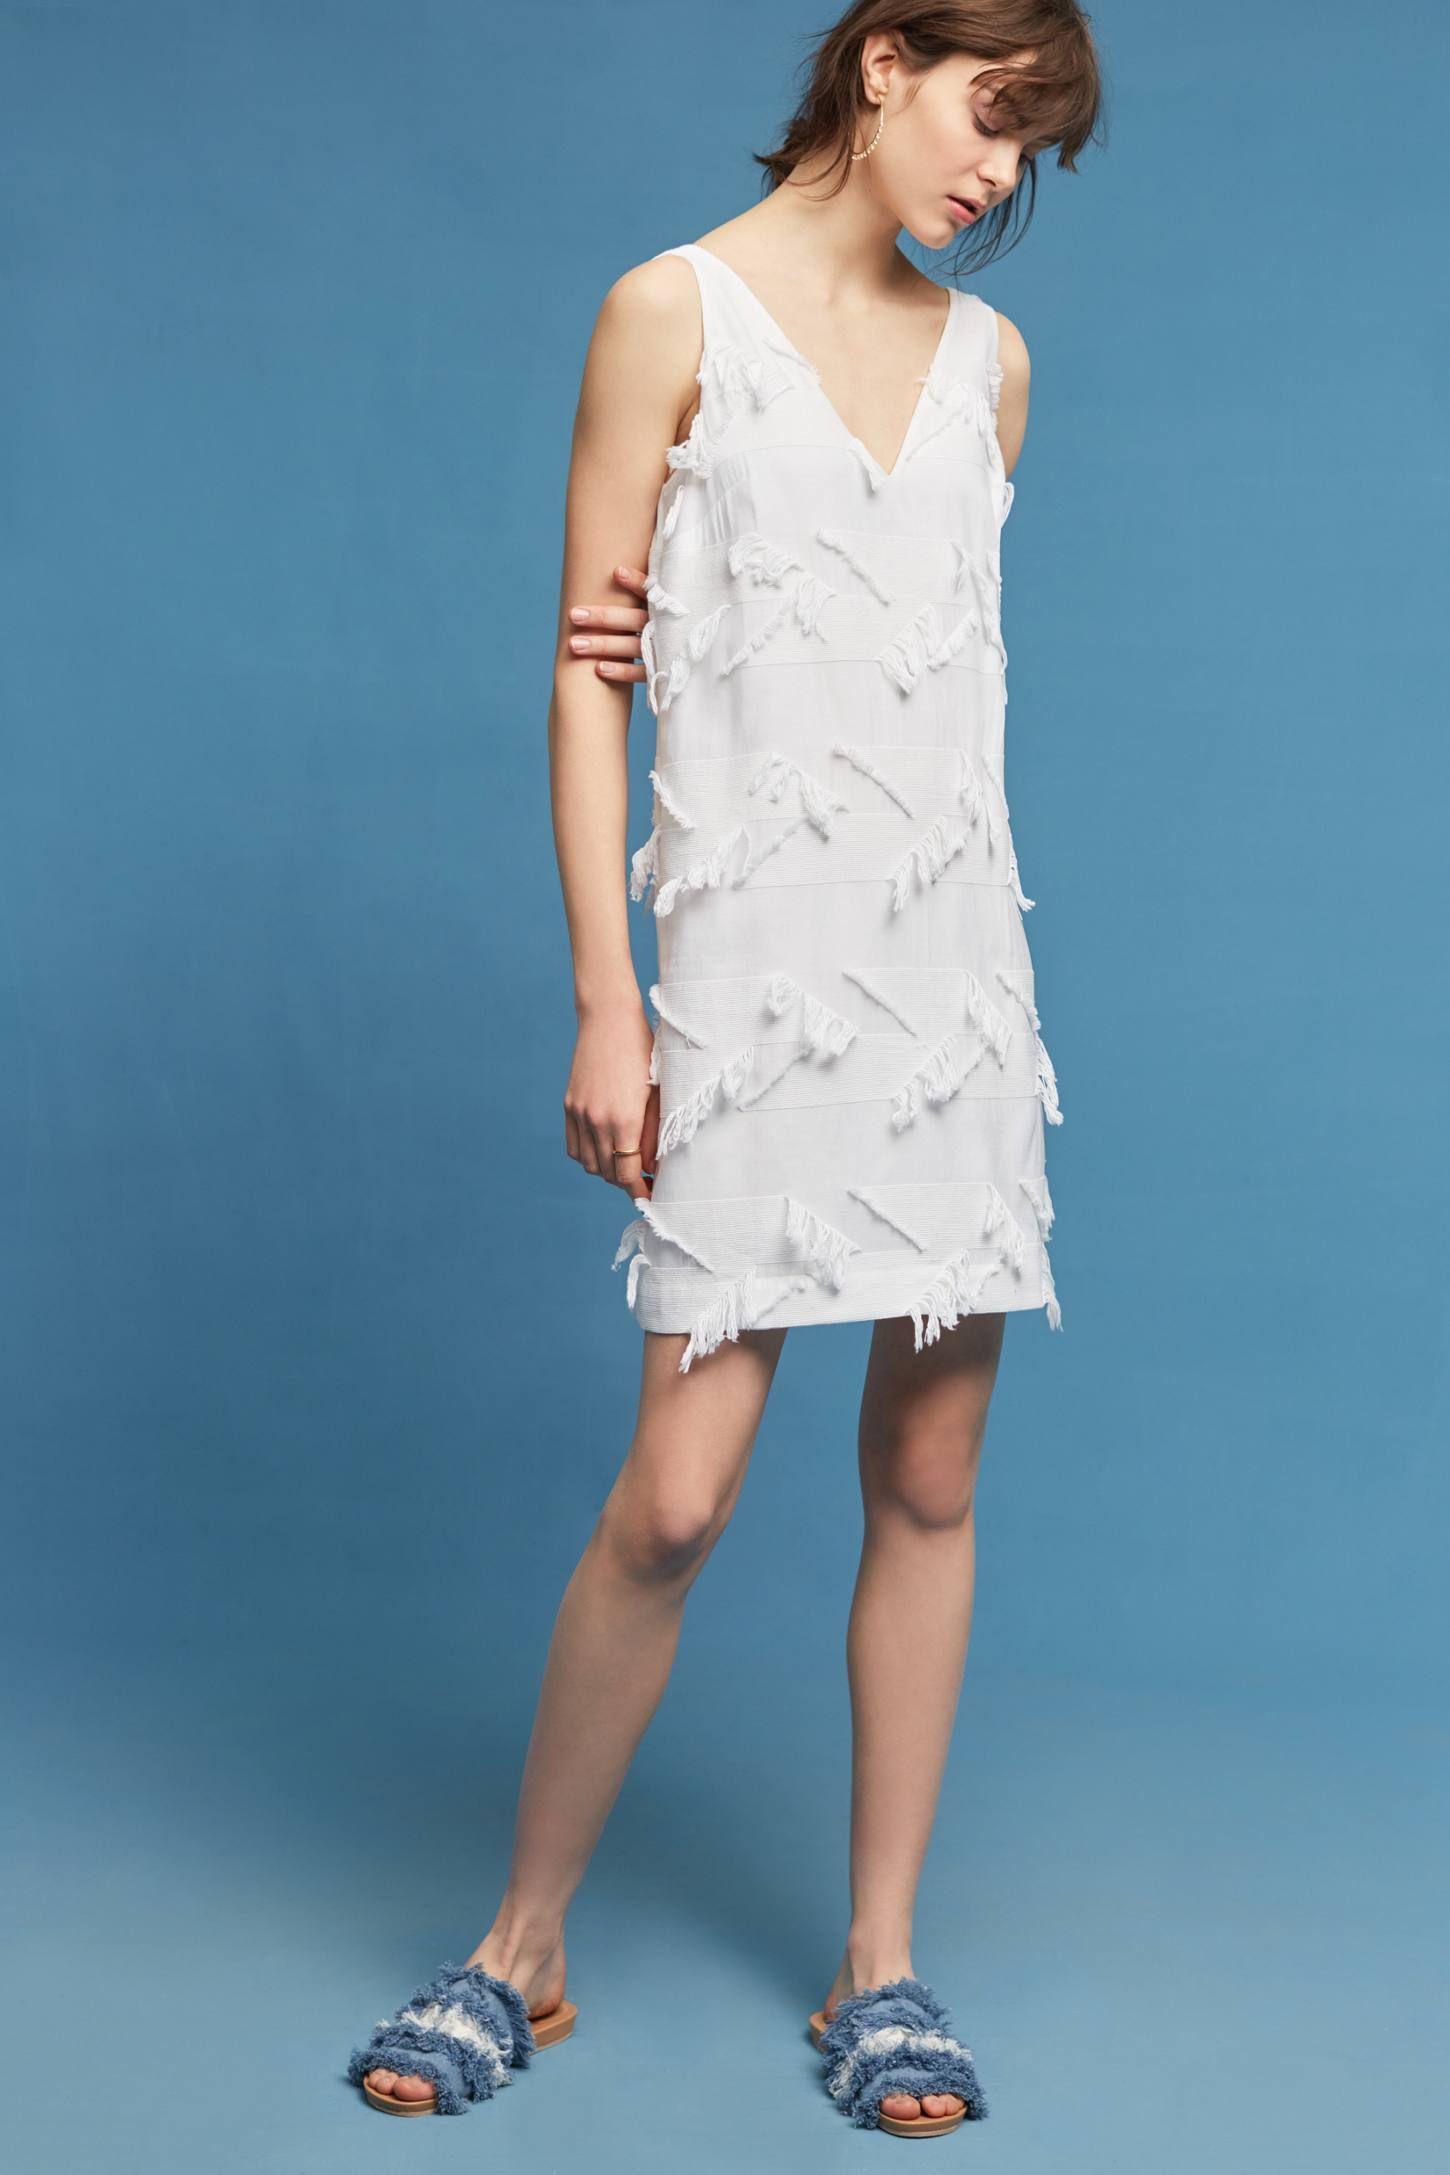 Excellent Anthro Wedding Dresses Gallery - Wedding Ideas - memiocall.com